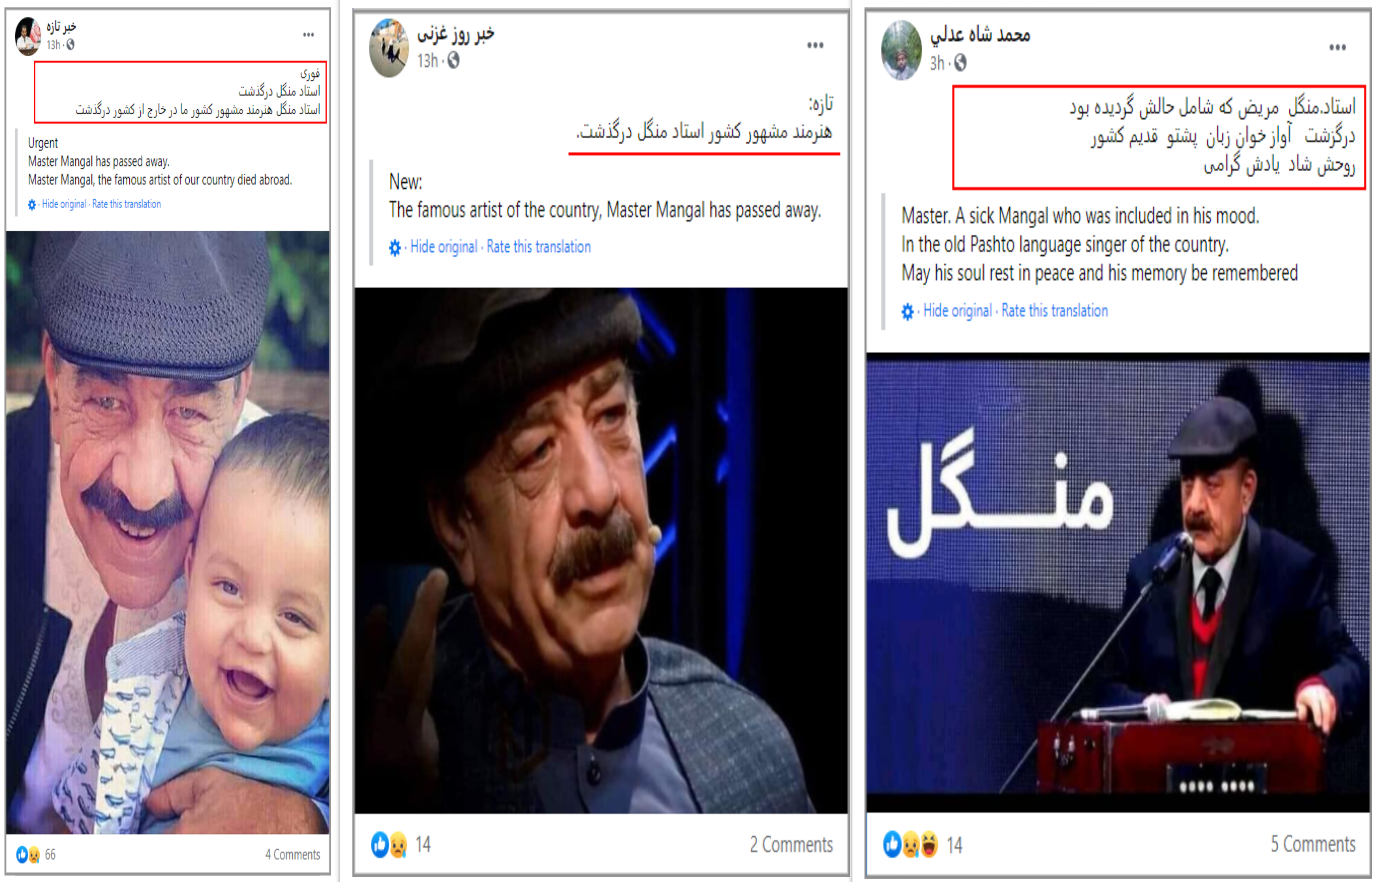 C:\Users\Mujtaba Ali\Desktop\03.06.2021\collage.png